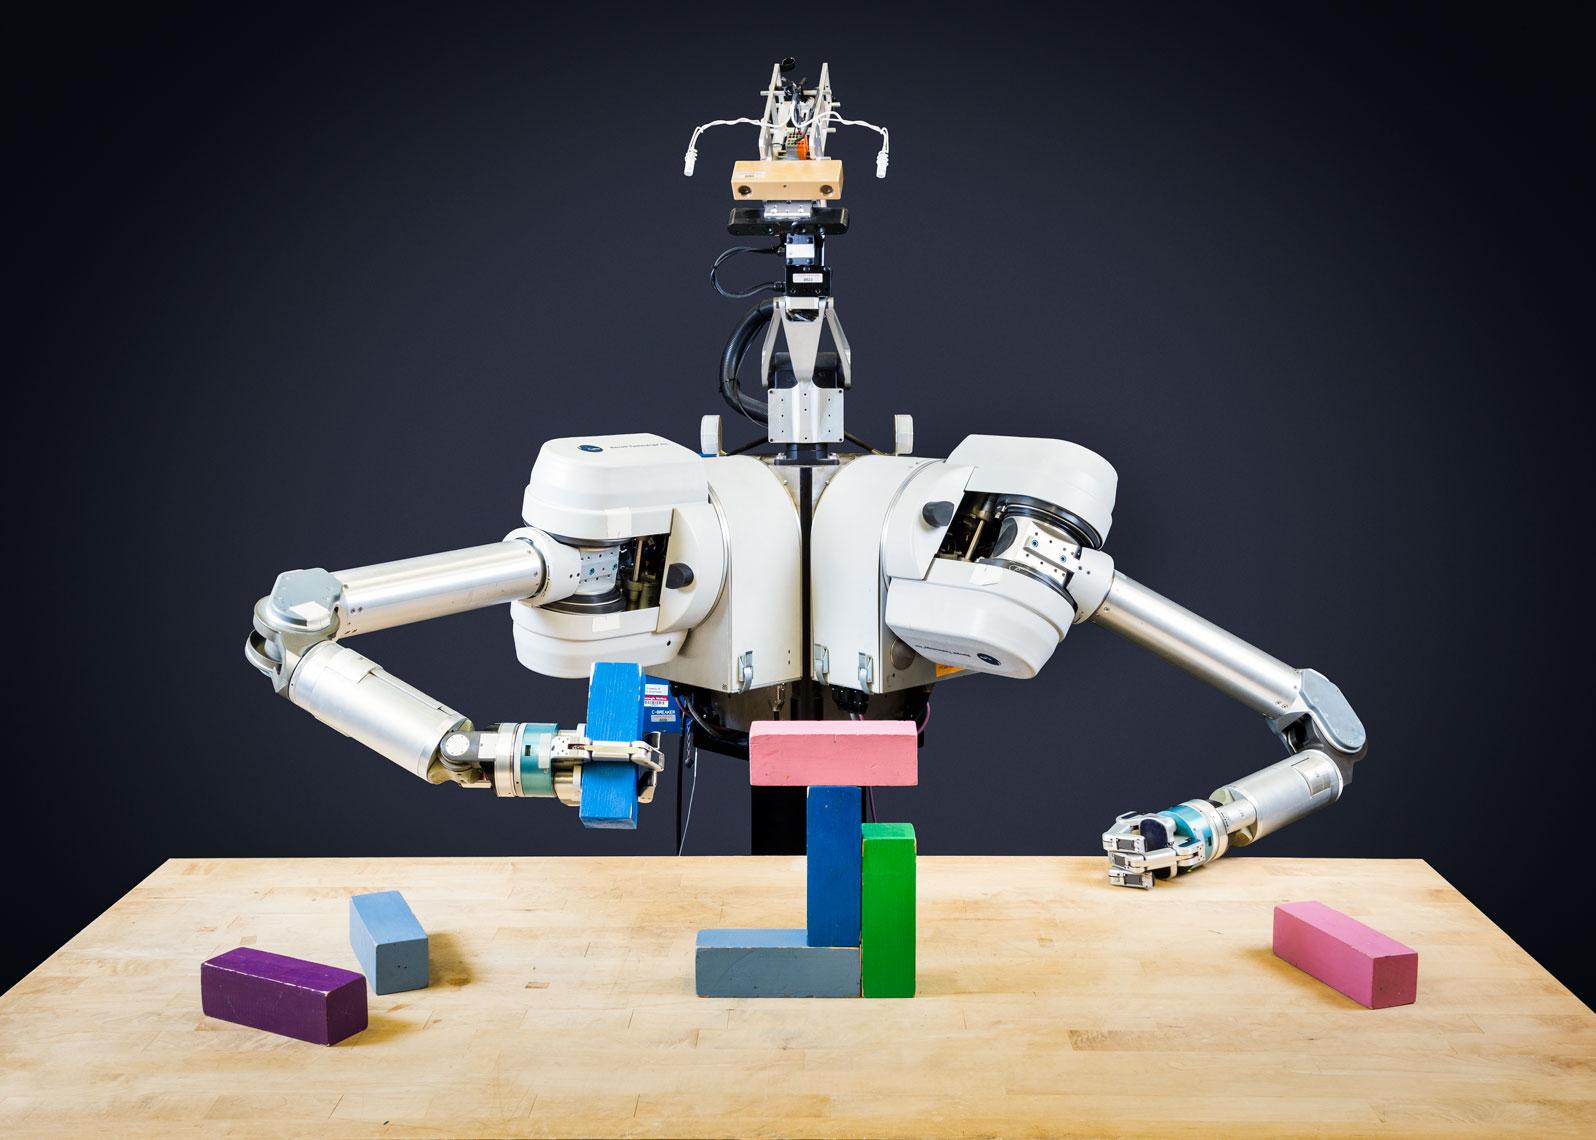 Robotics Institute at Carnegie Mellon, Pittsburgh, PA